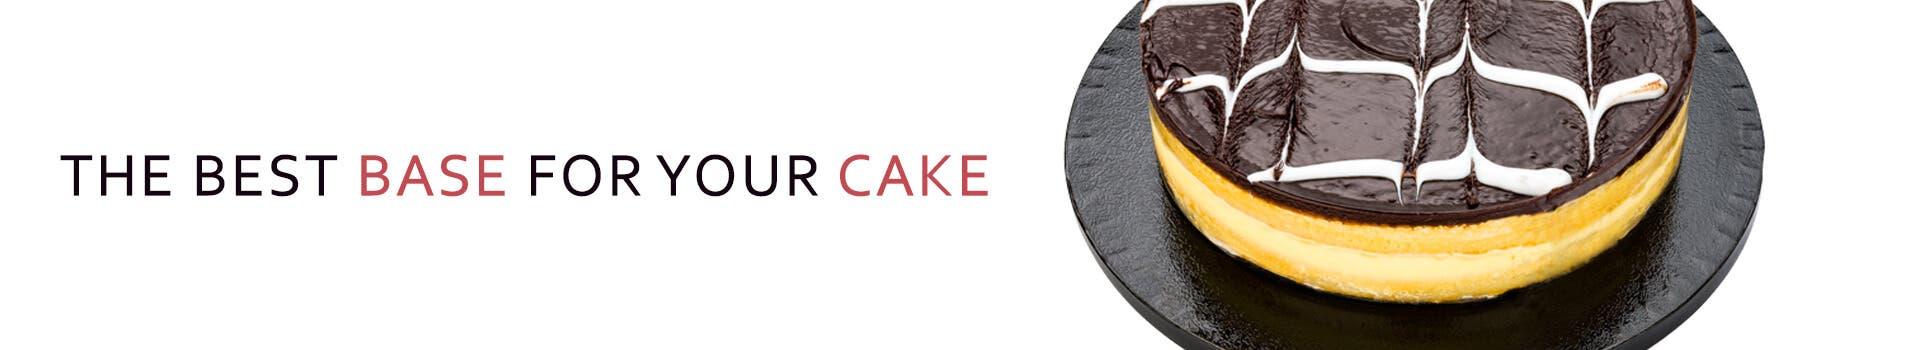 Cake Drums